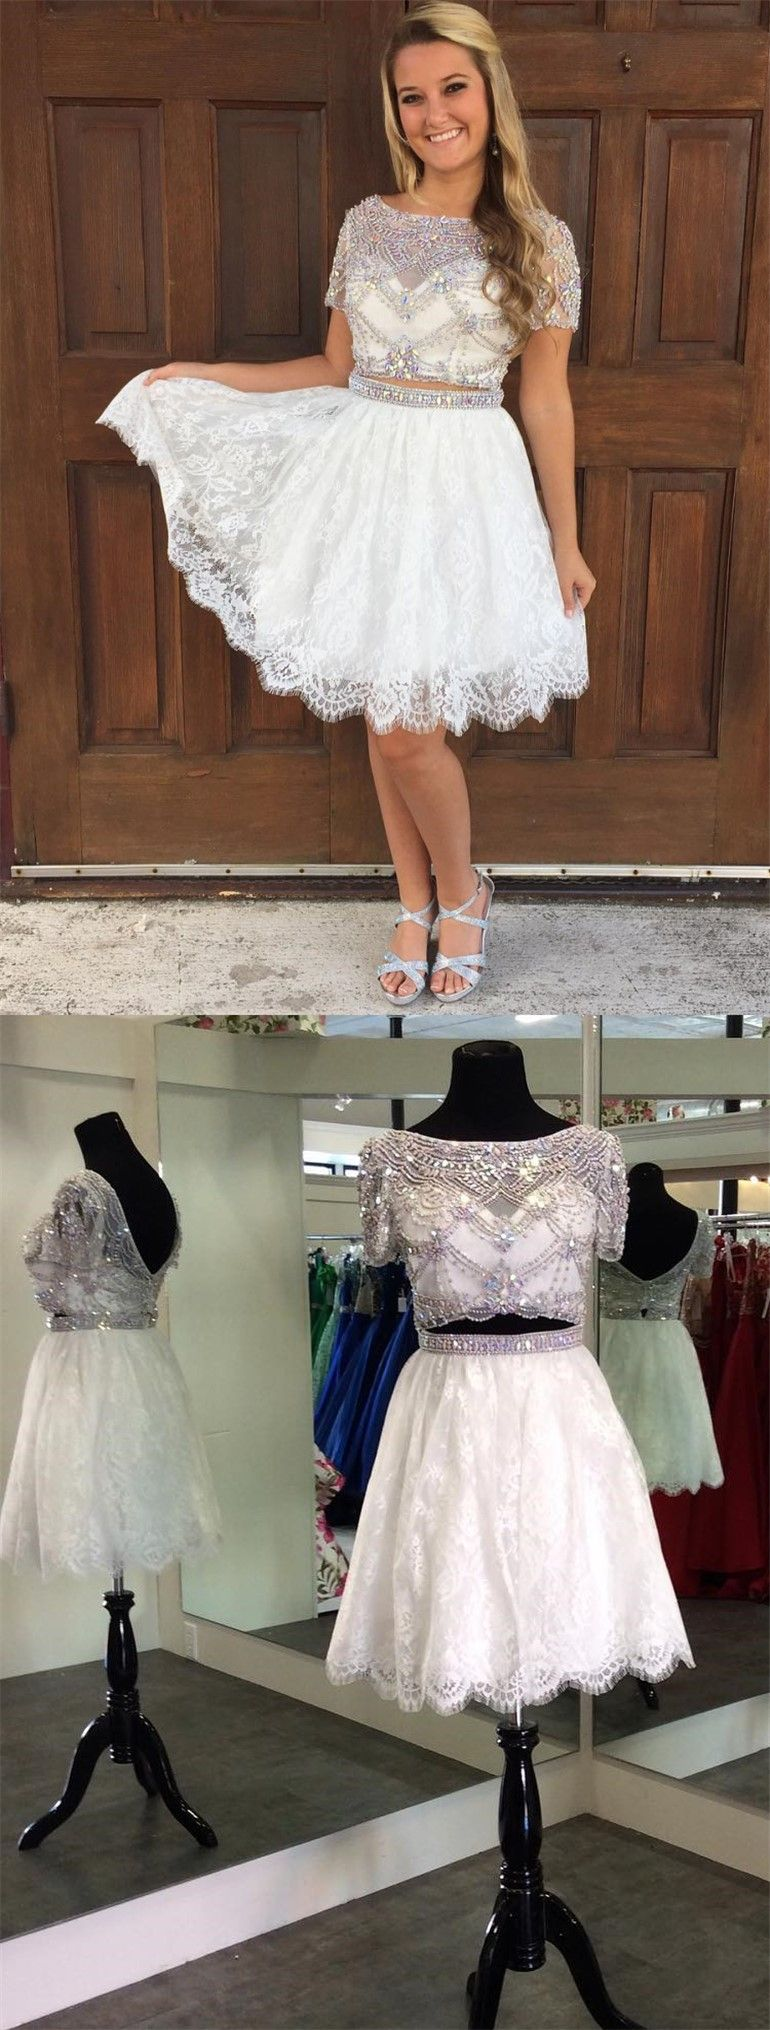 Luxurious homecoming dressbeaded homecoming dresstwo piece